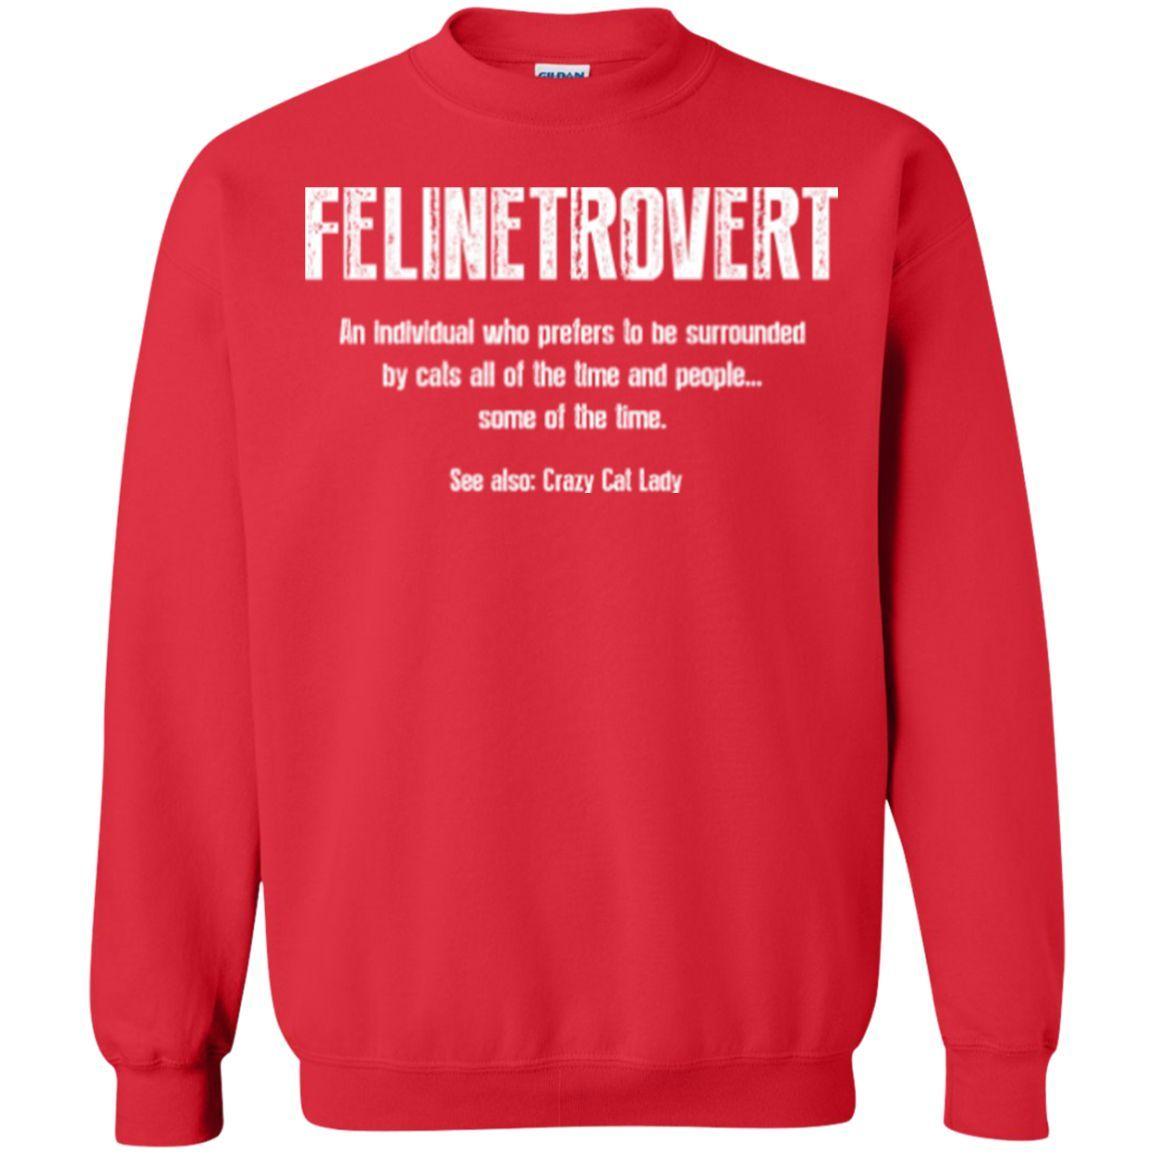 Felinetrovert - Sweatshirt